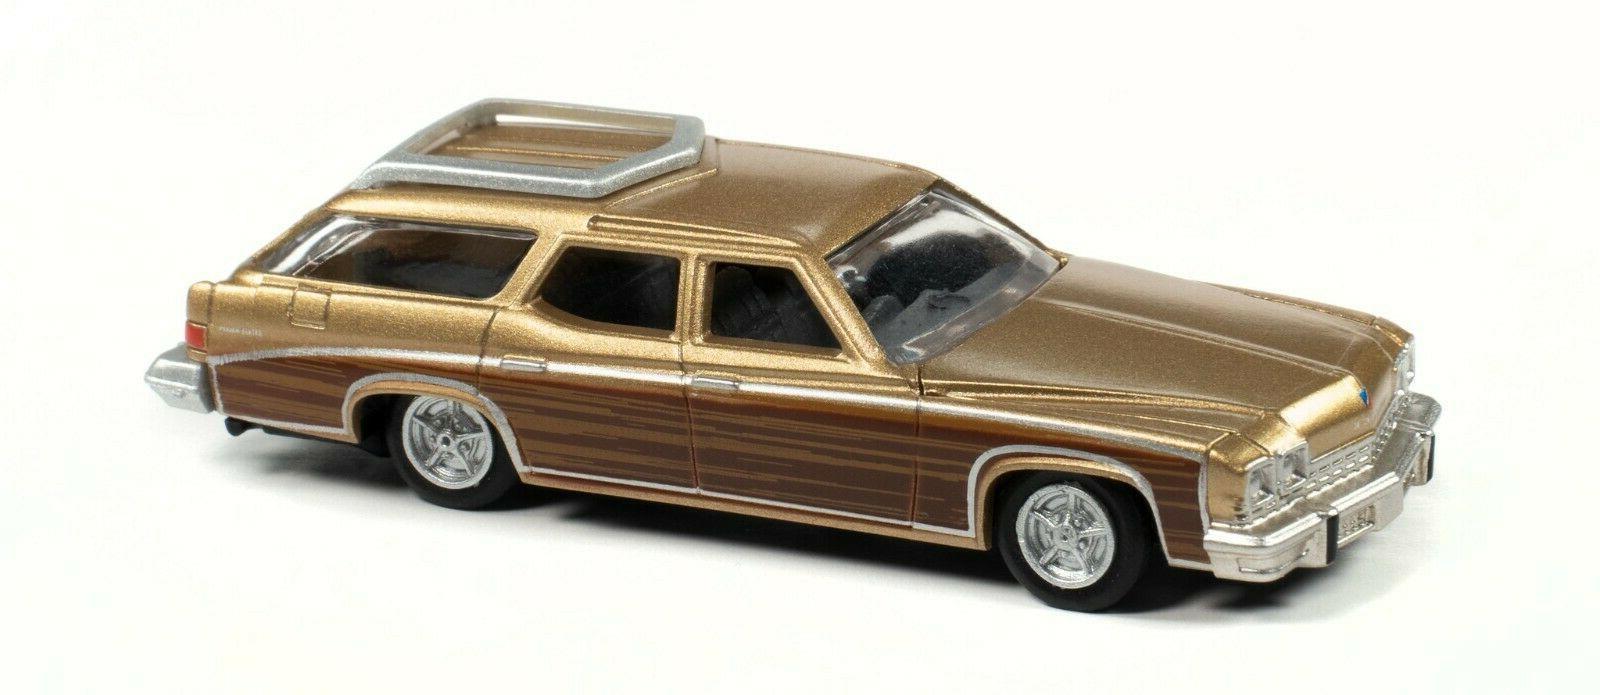 1974 BUICK GOLD CAR METAL WORKS 30586